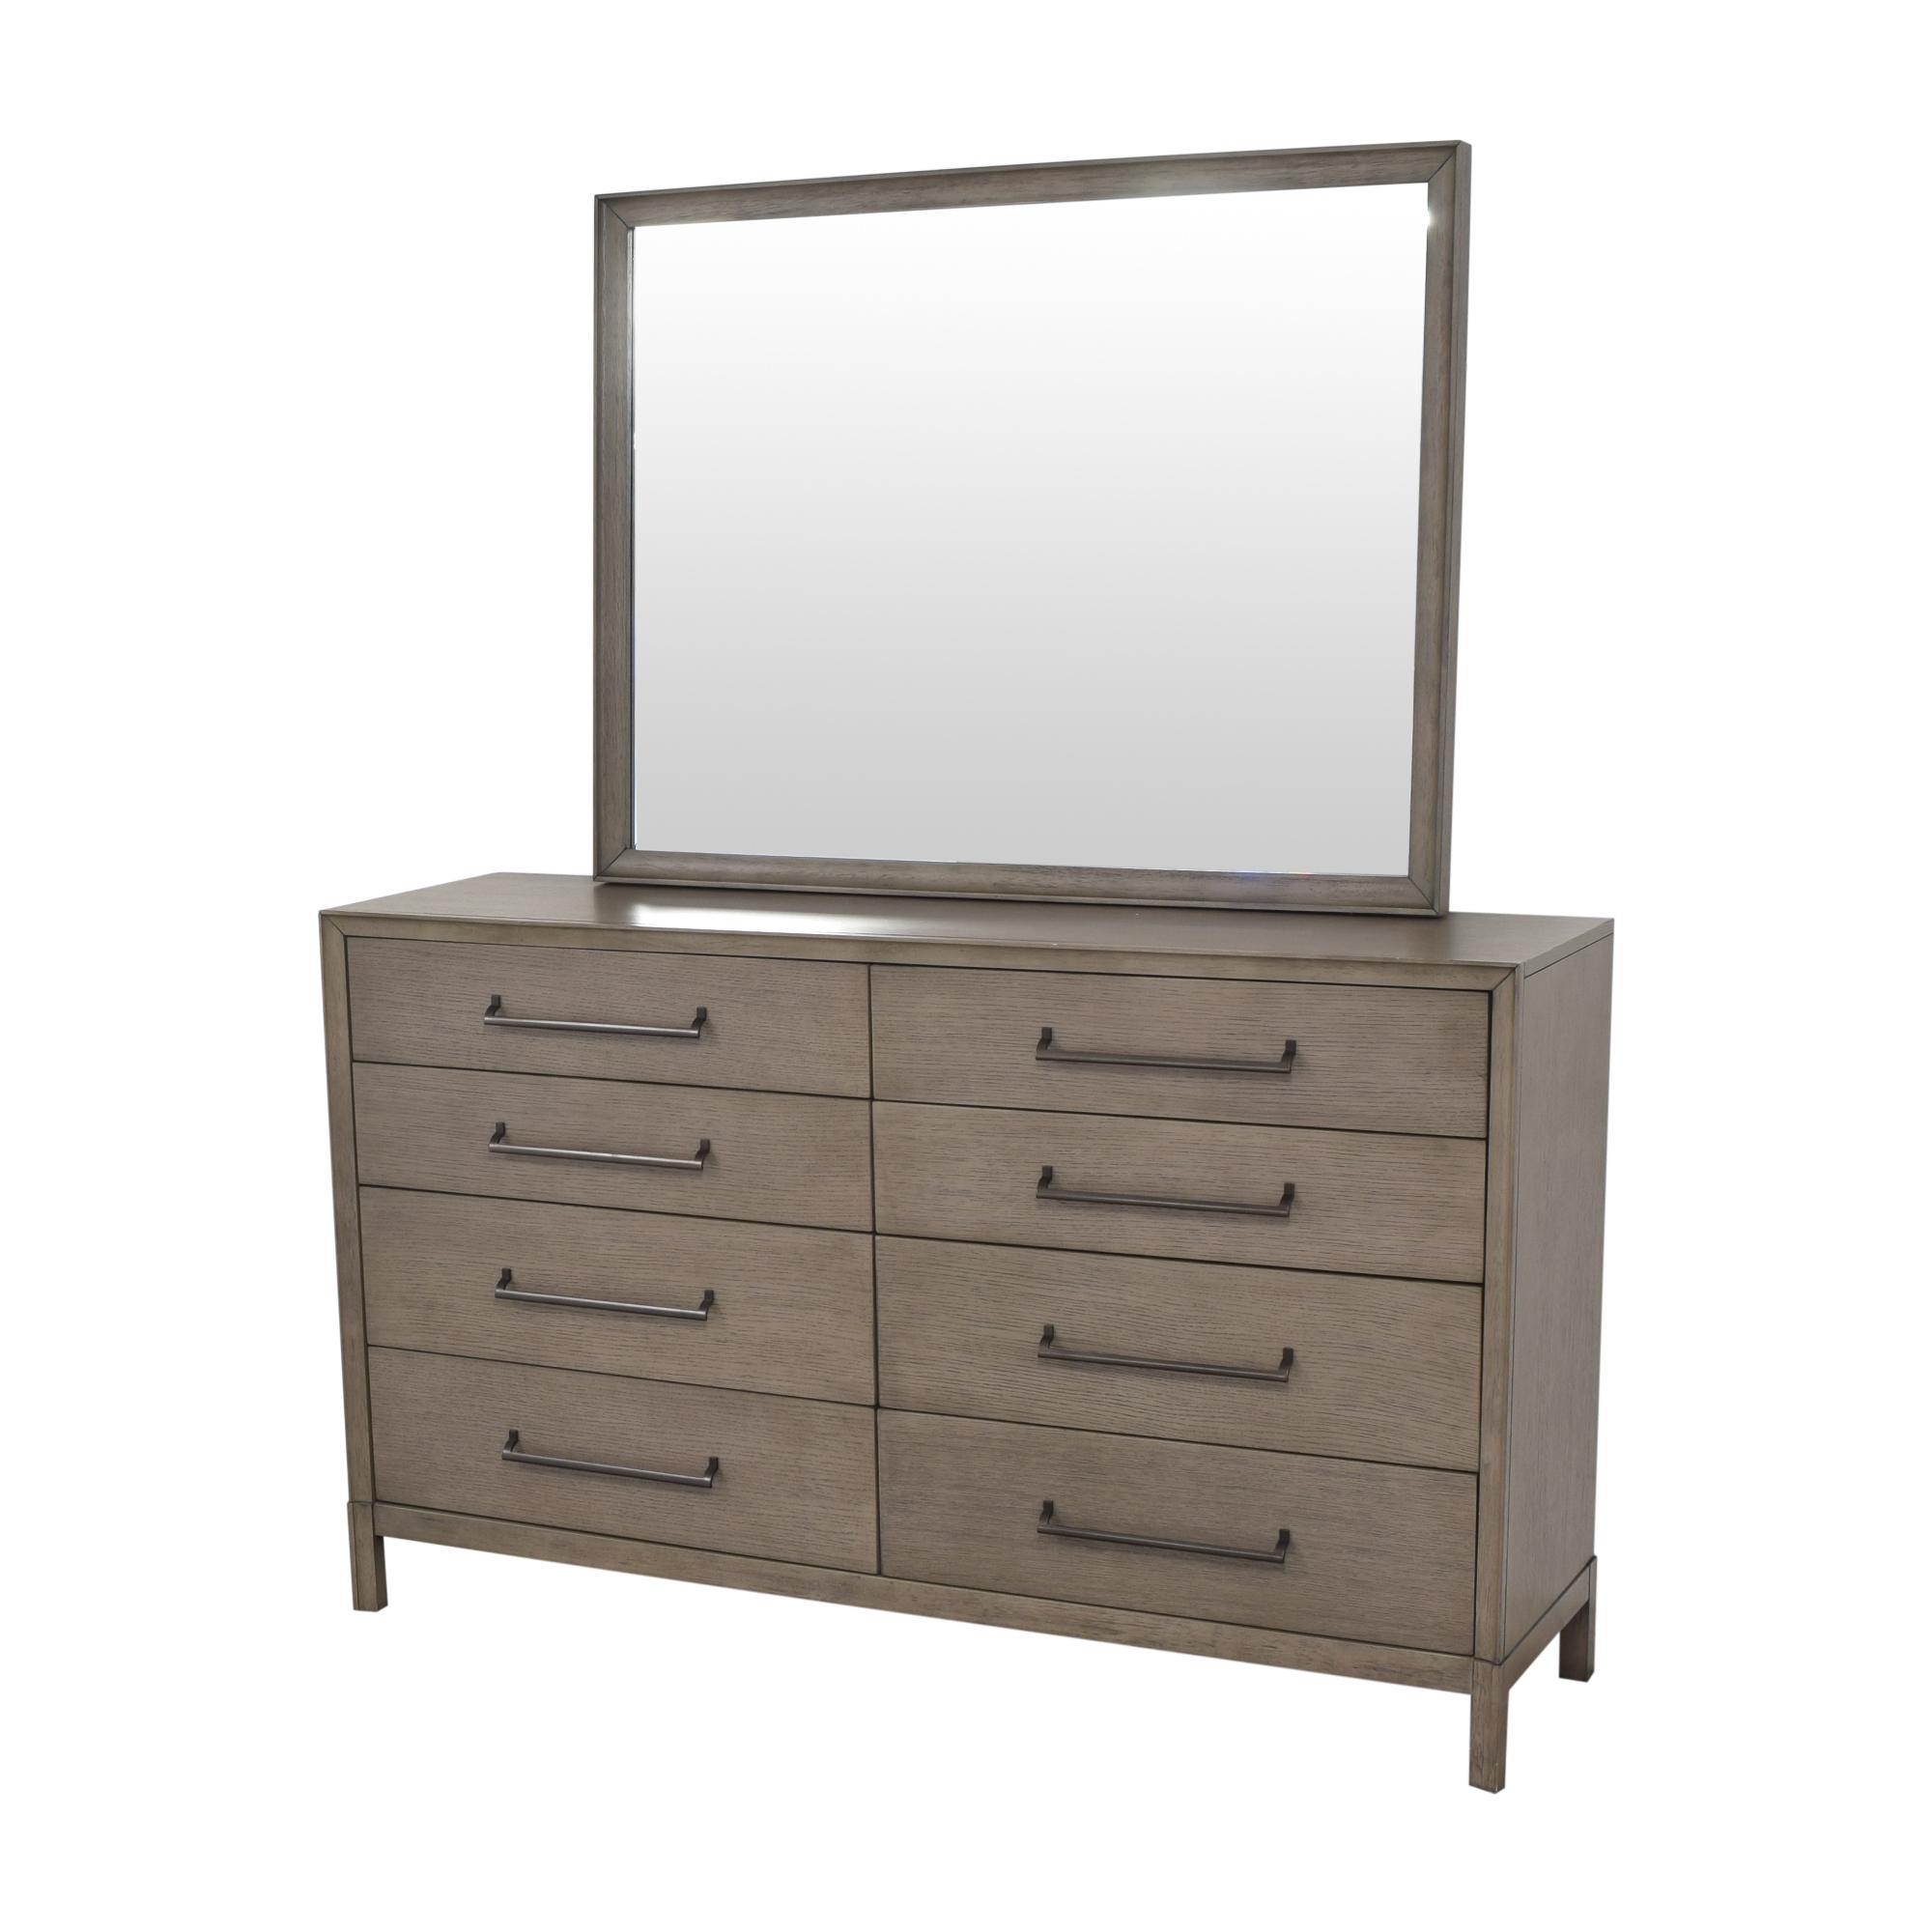 Casana Double Dresser with Mirror sale